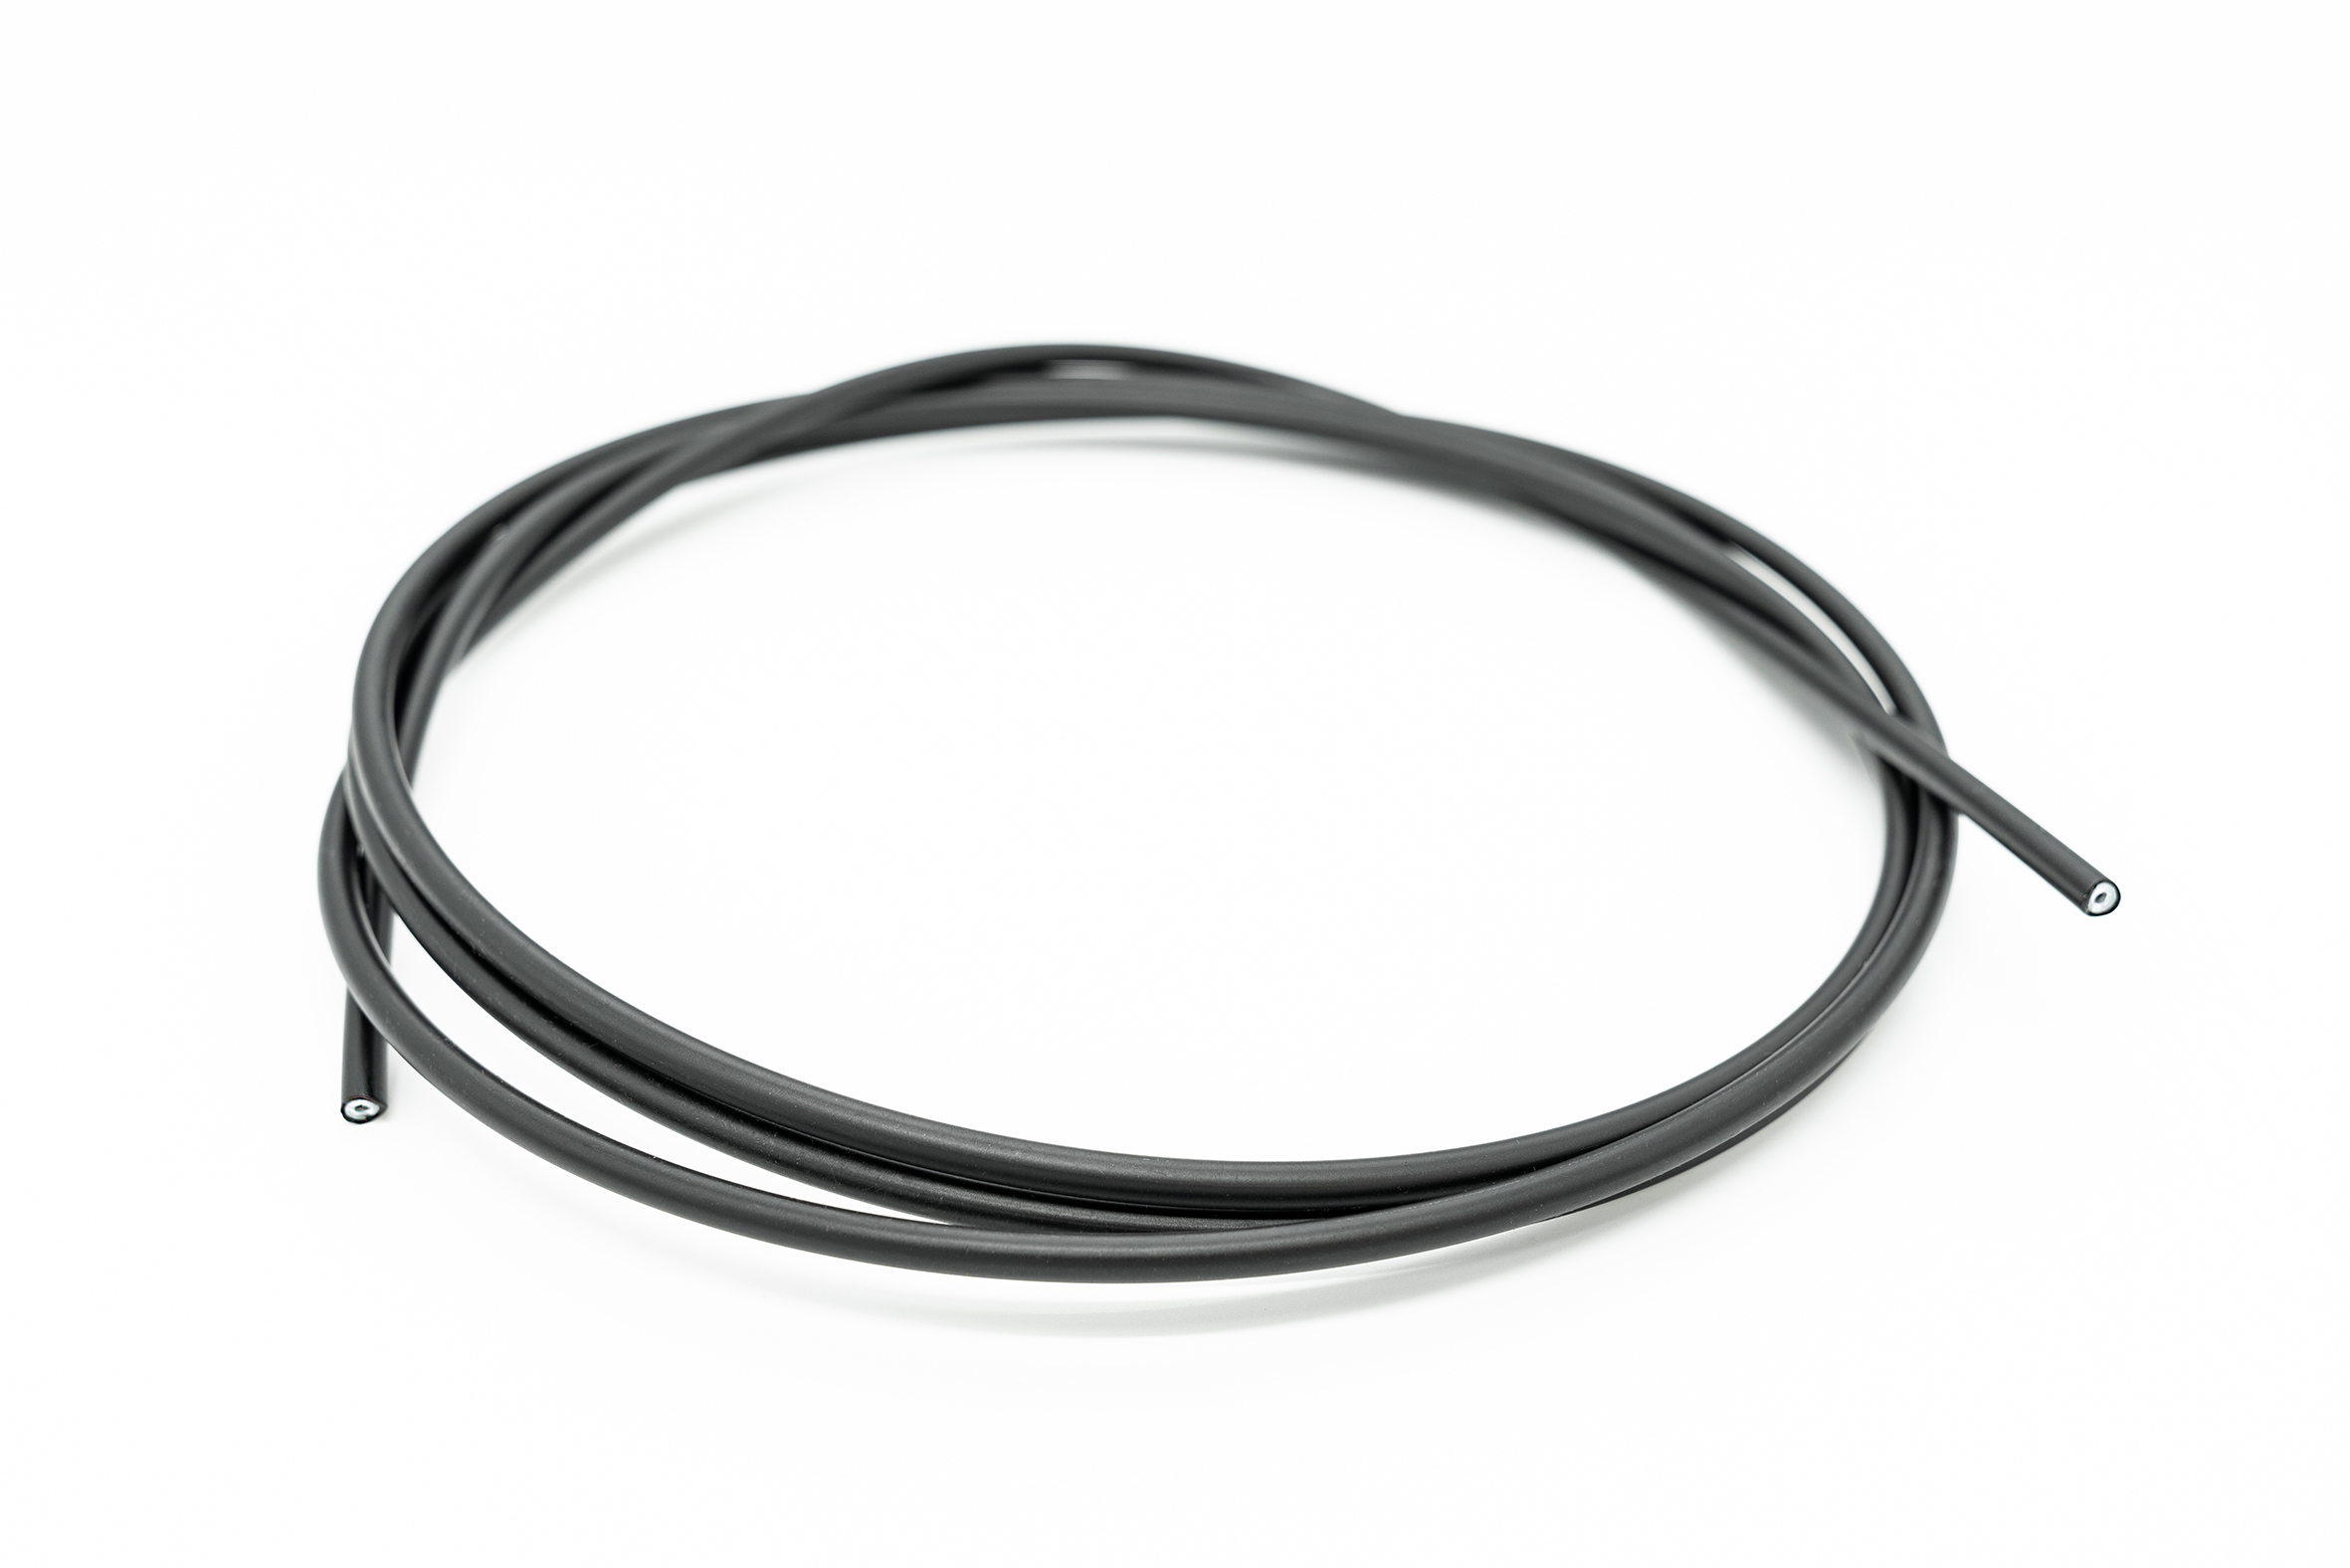 BWS Bowdenzug Kunststoff schwarz, 5mm